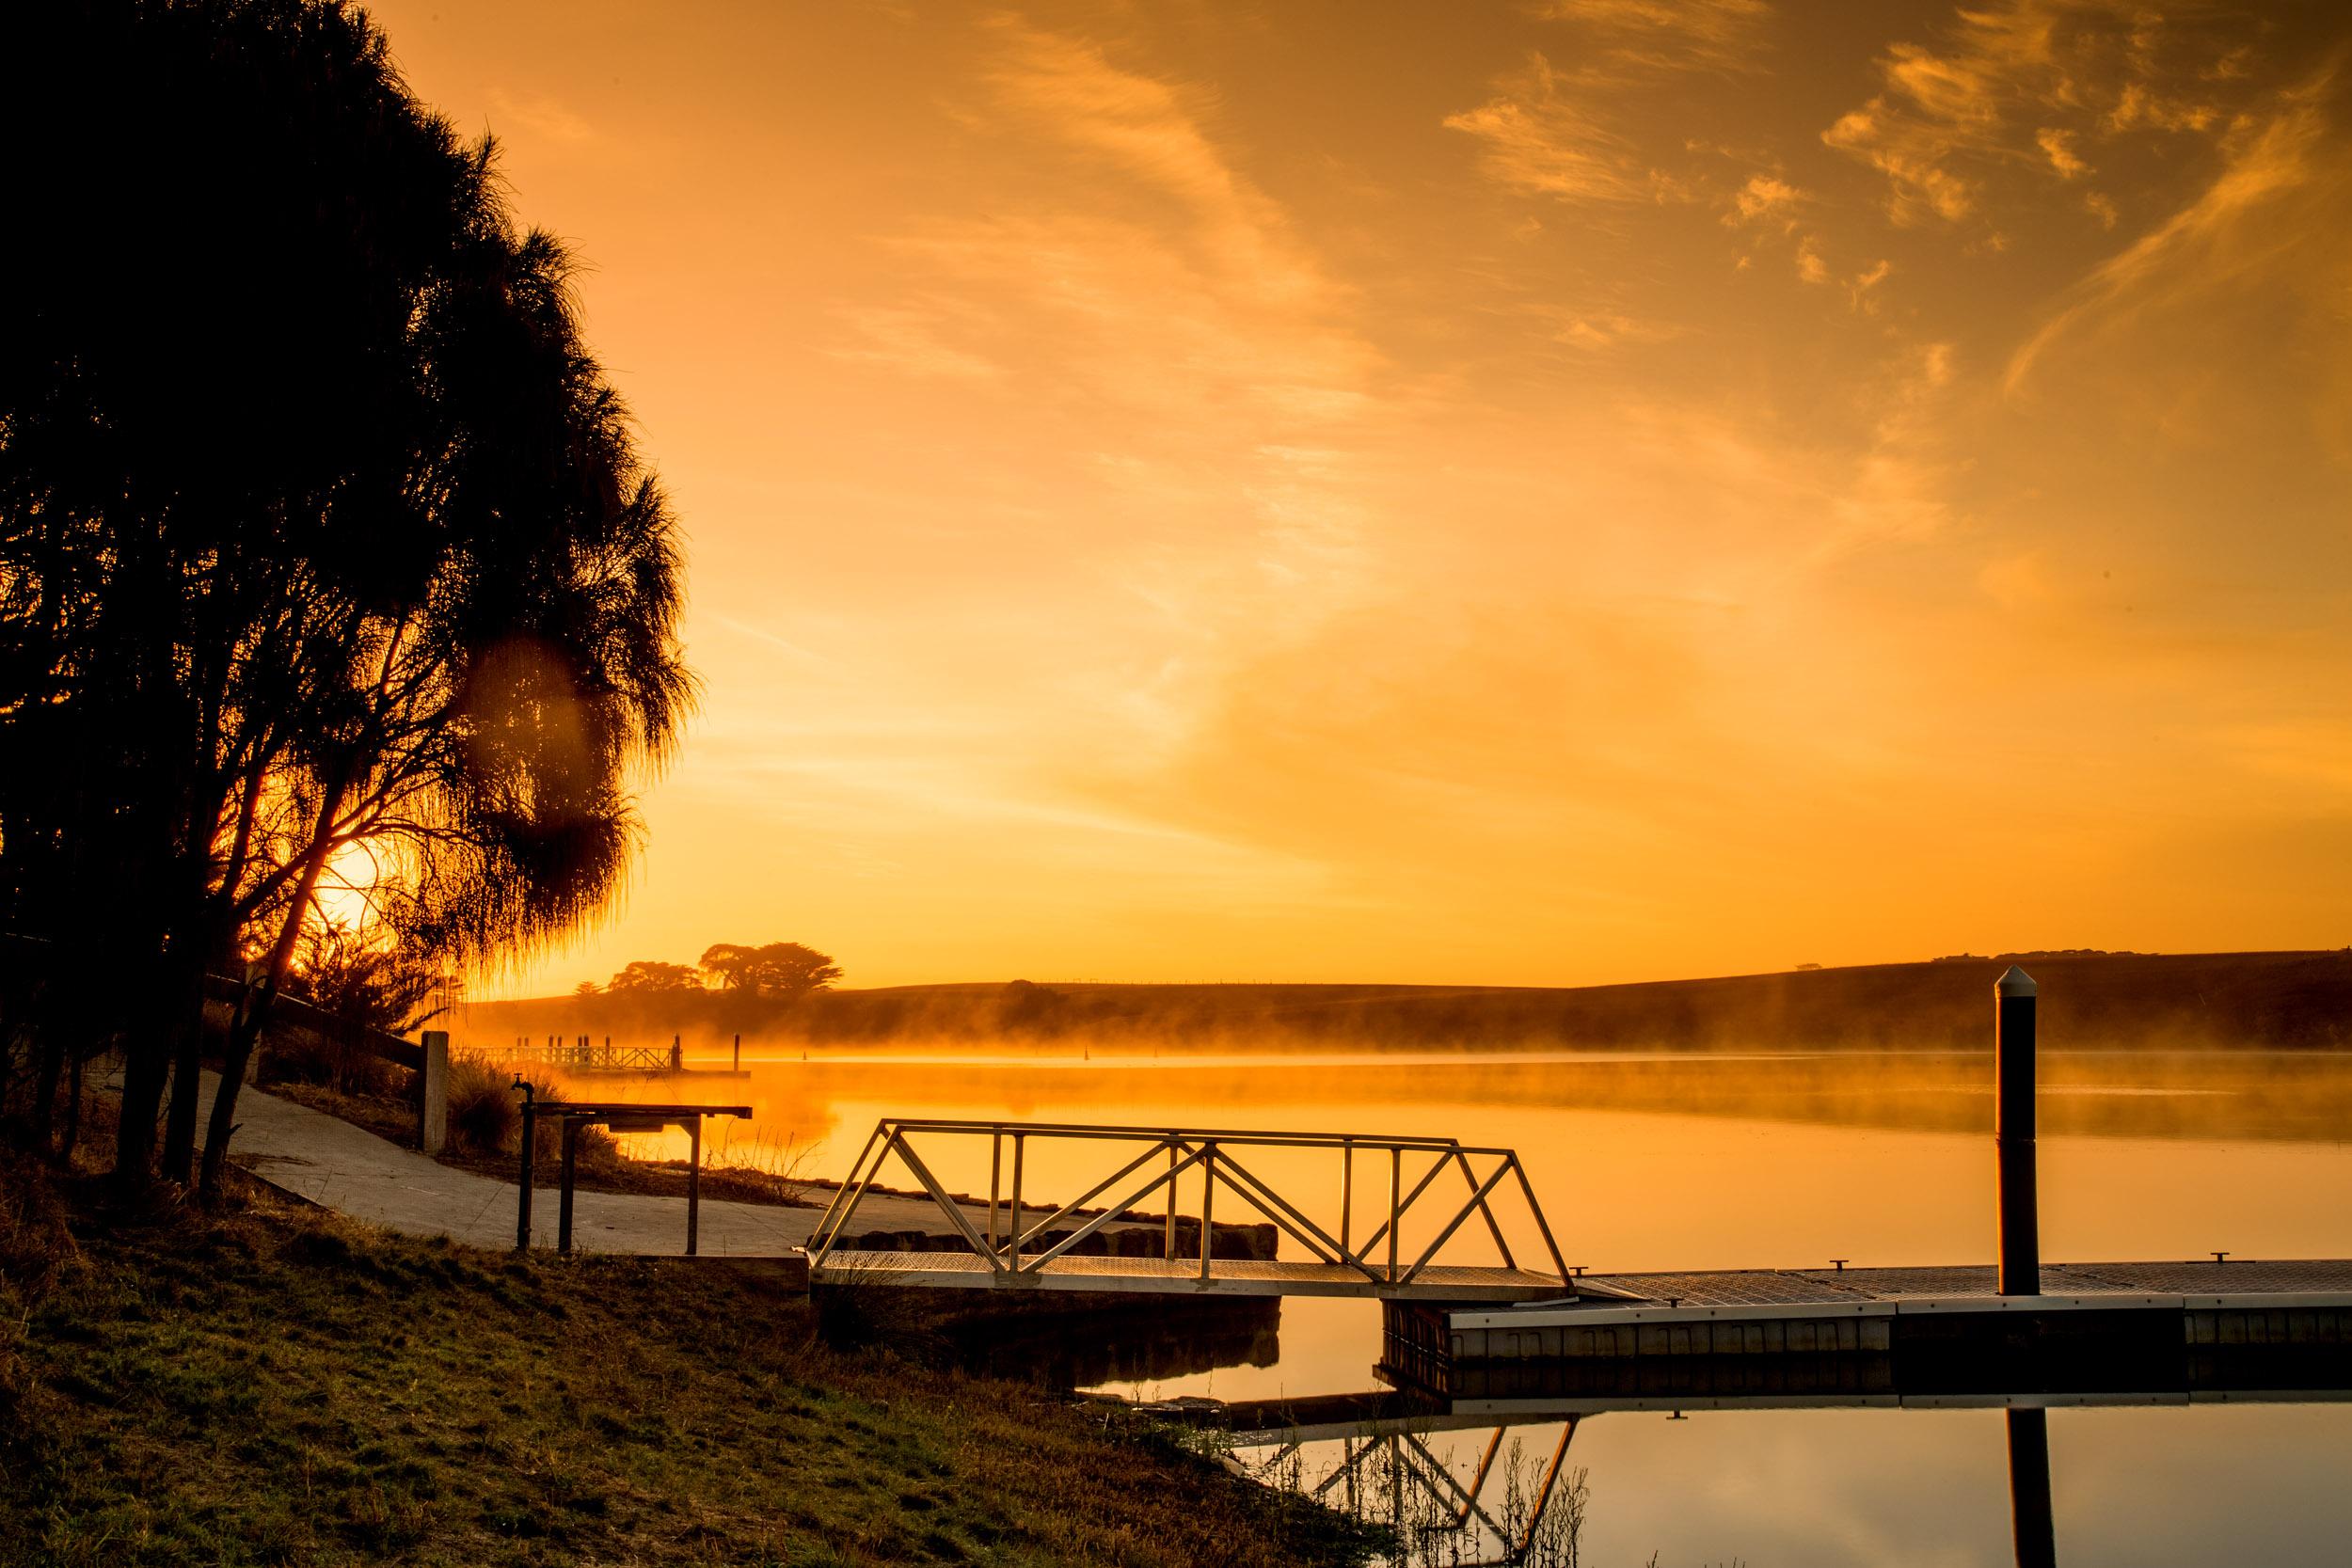 sunrise-hopkins-river-victoria.jpg